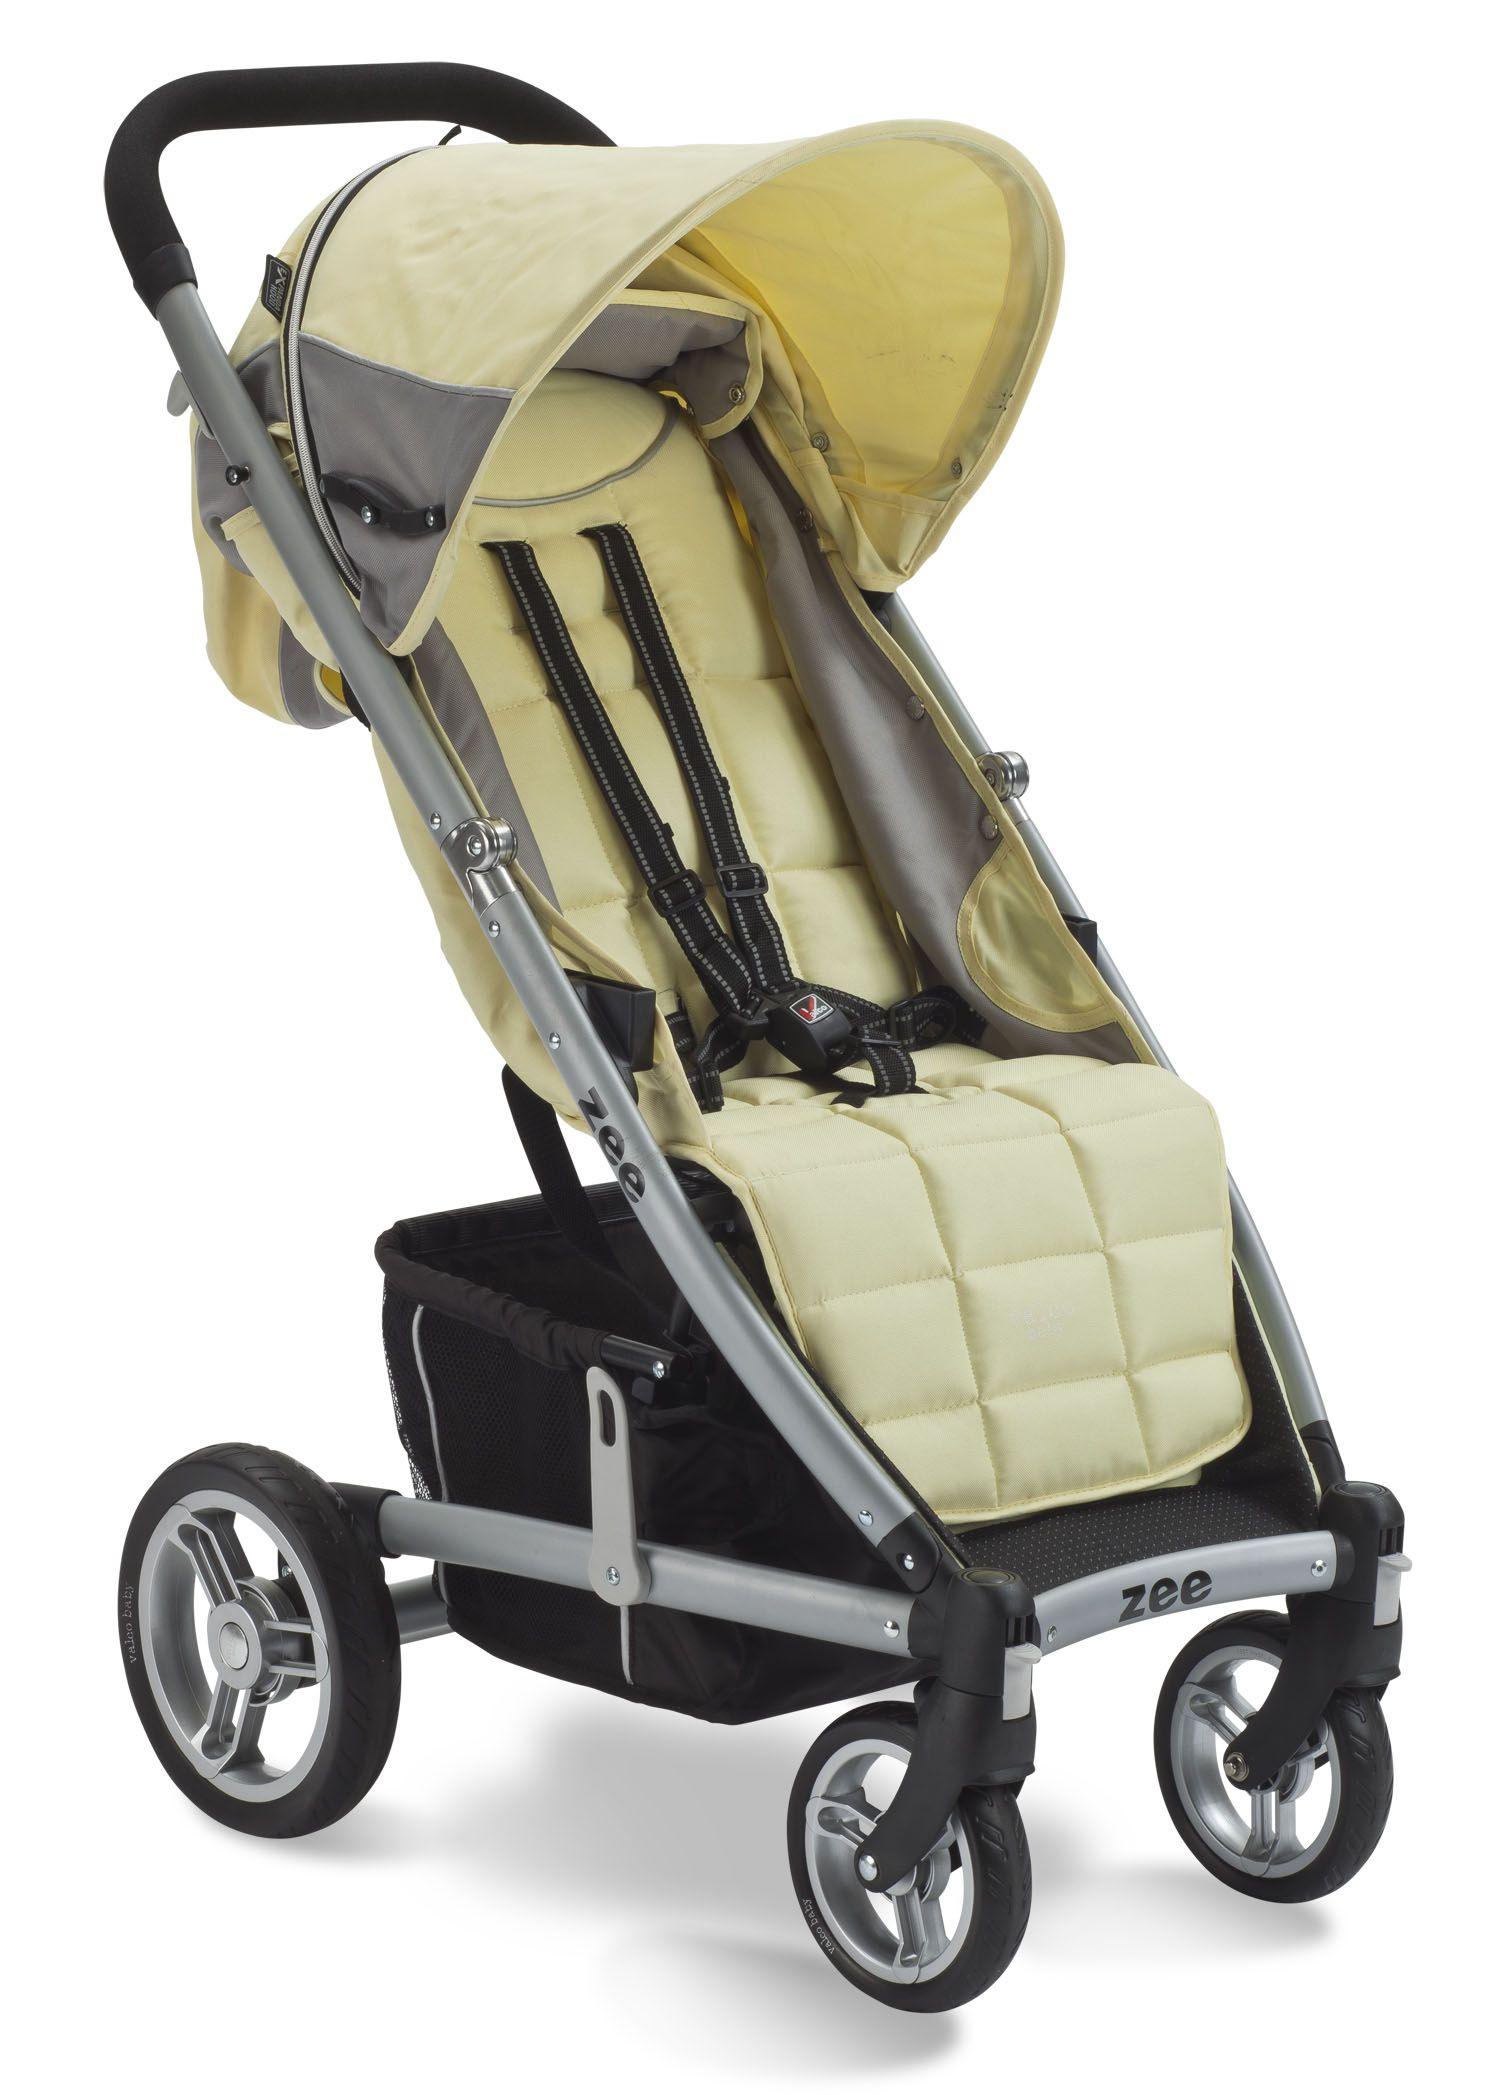 valcozeecitrine Single stroller, Stroller, Baby strollers